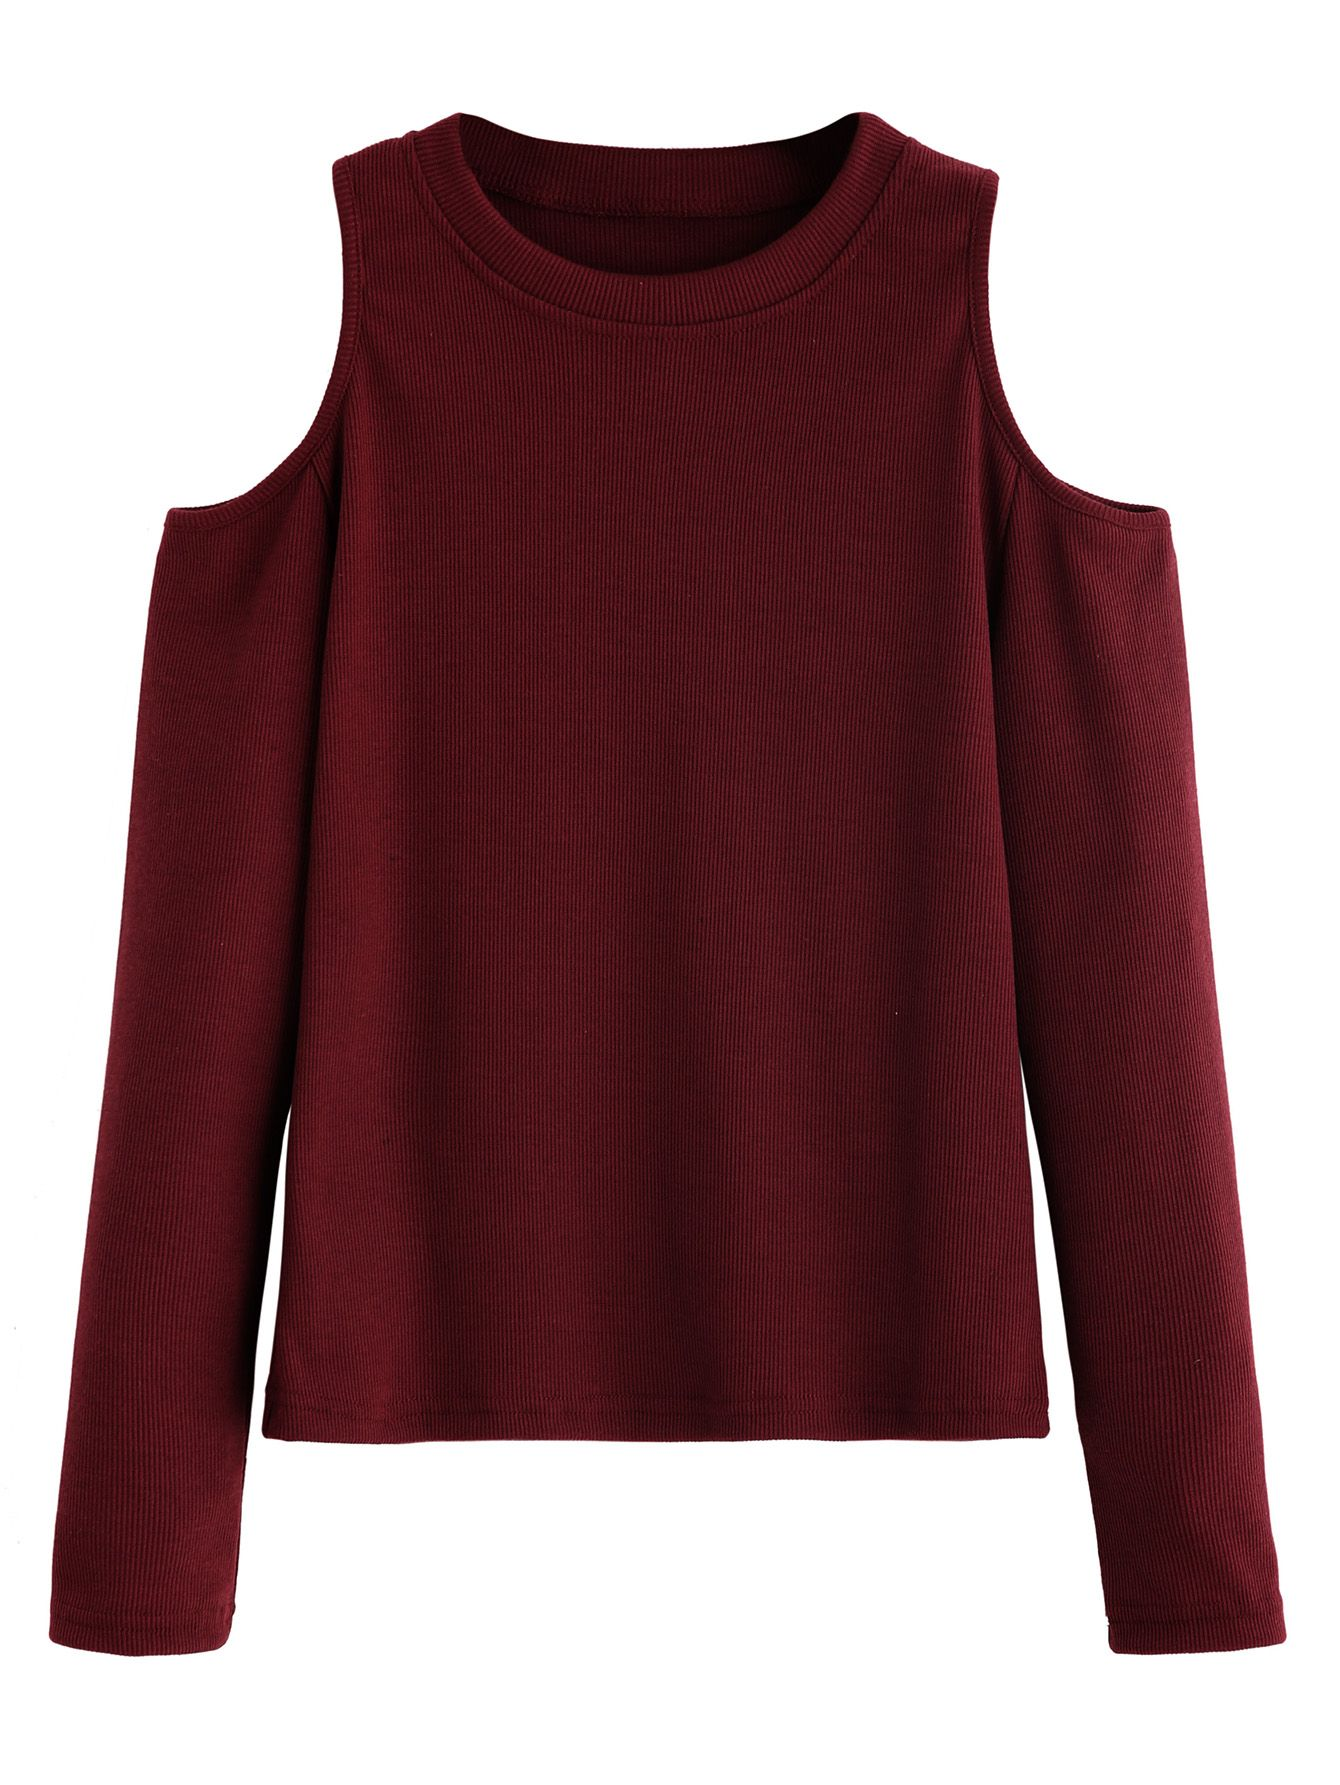 66250ea7be7 Where to buy that one shirt Ropa Bonita